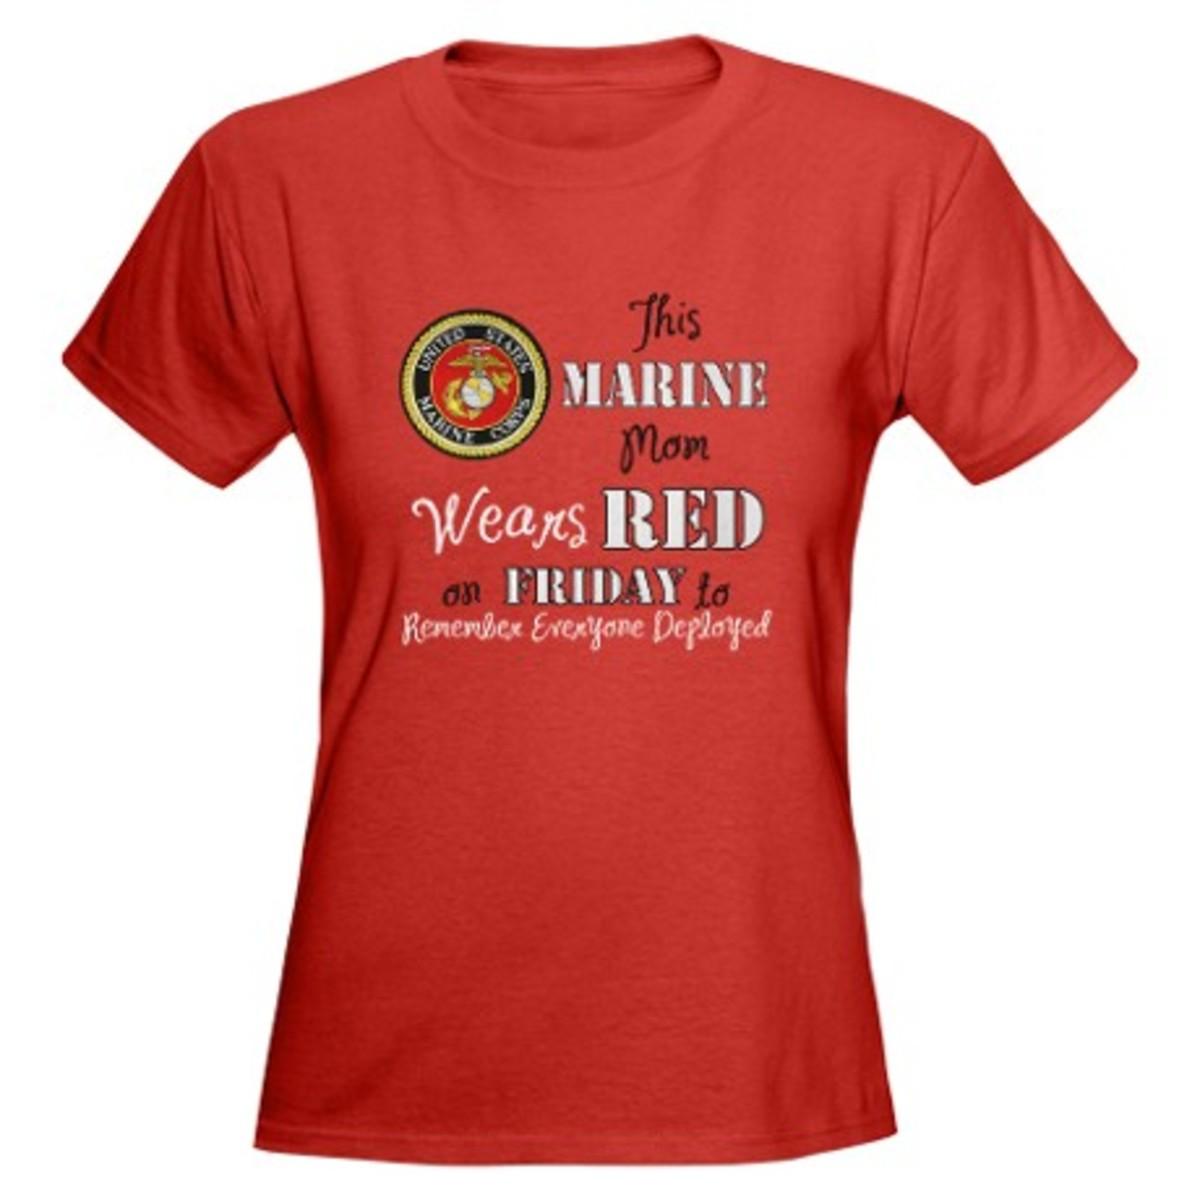 Order Red Friday Shirt on CafePress